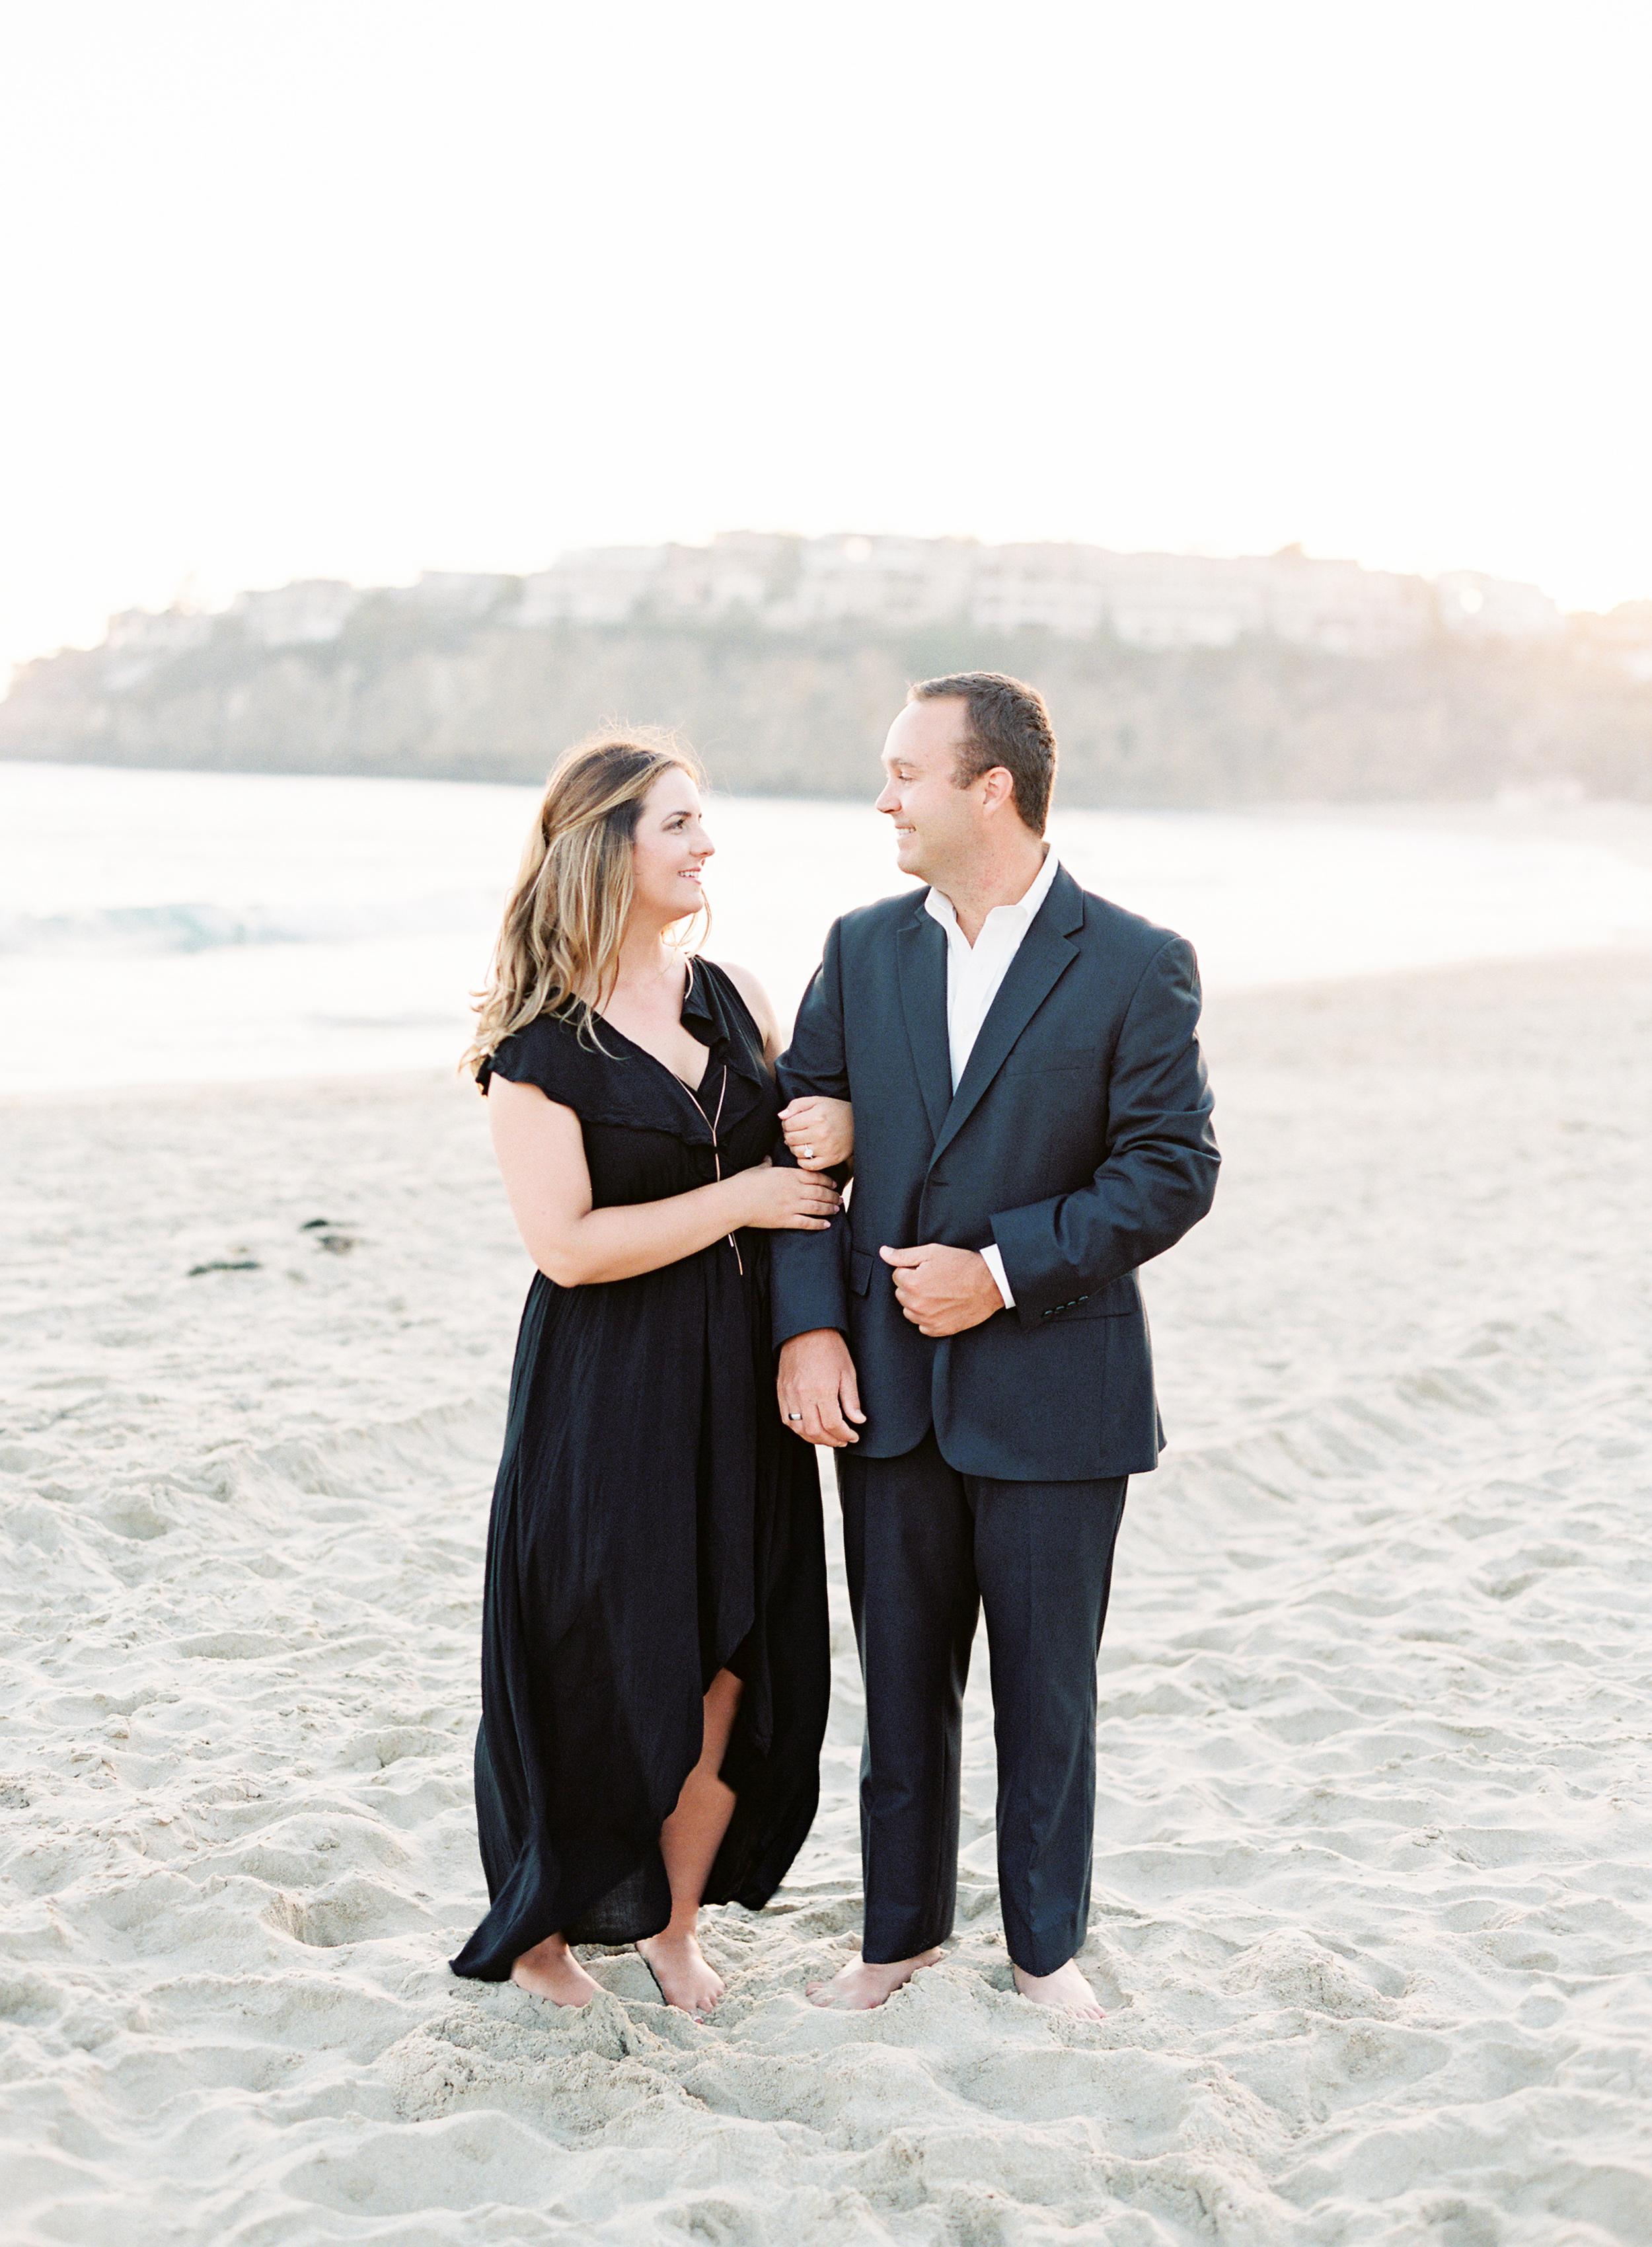 Laguna-Beach-Engagement-Film-Wedding-Orange-County-86.jpg